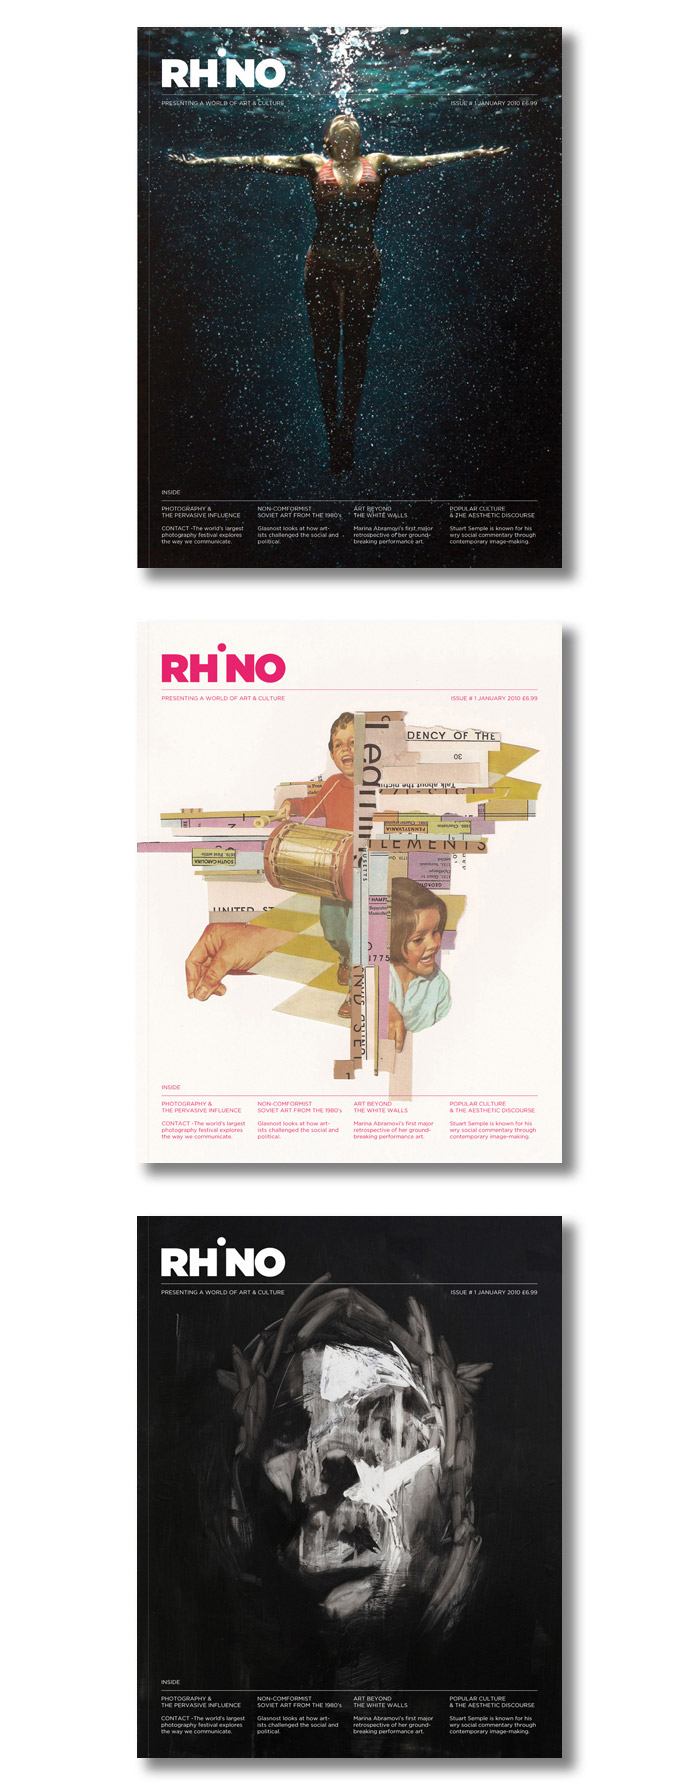 Mads Thorsoe / Magazine concept - Rhino